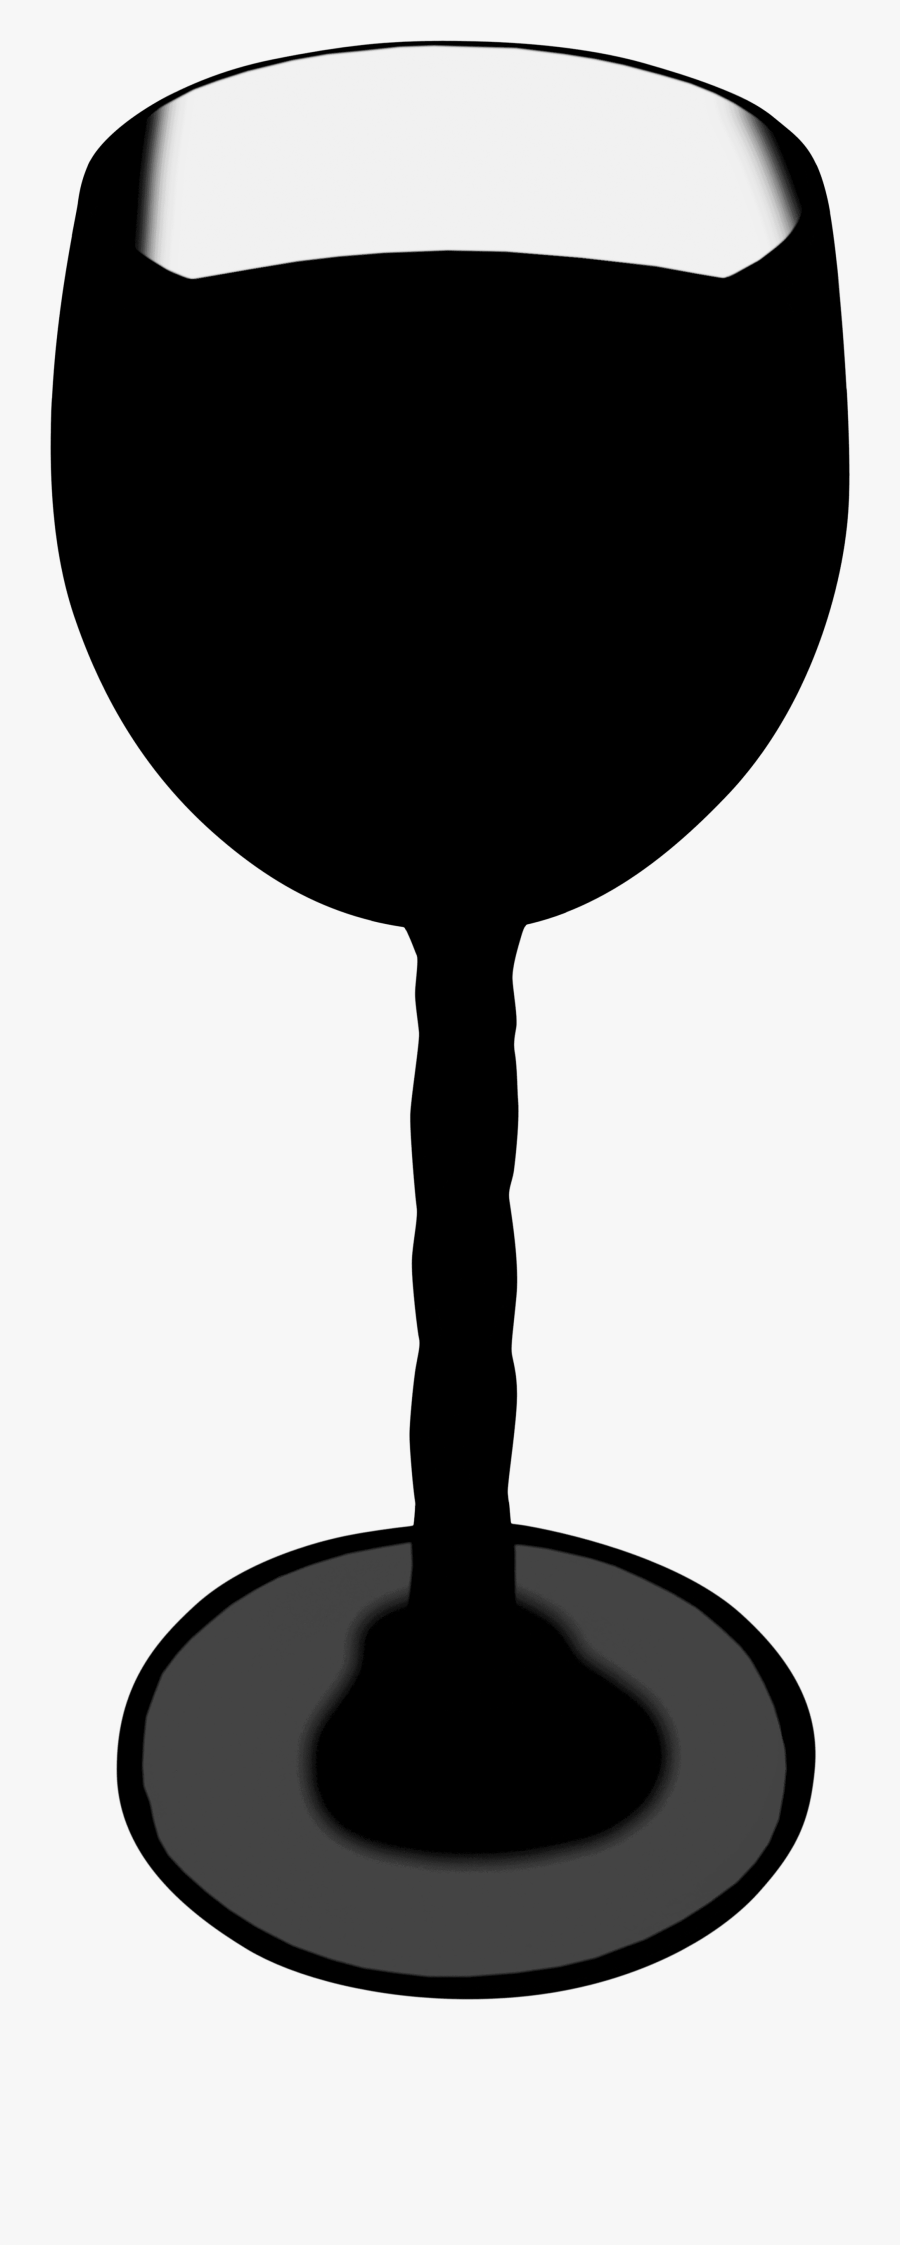 Glass Silhouette, Transparent Clipart